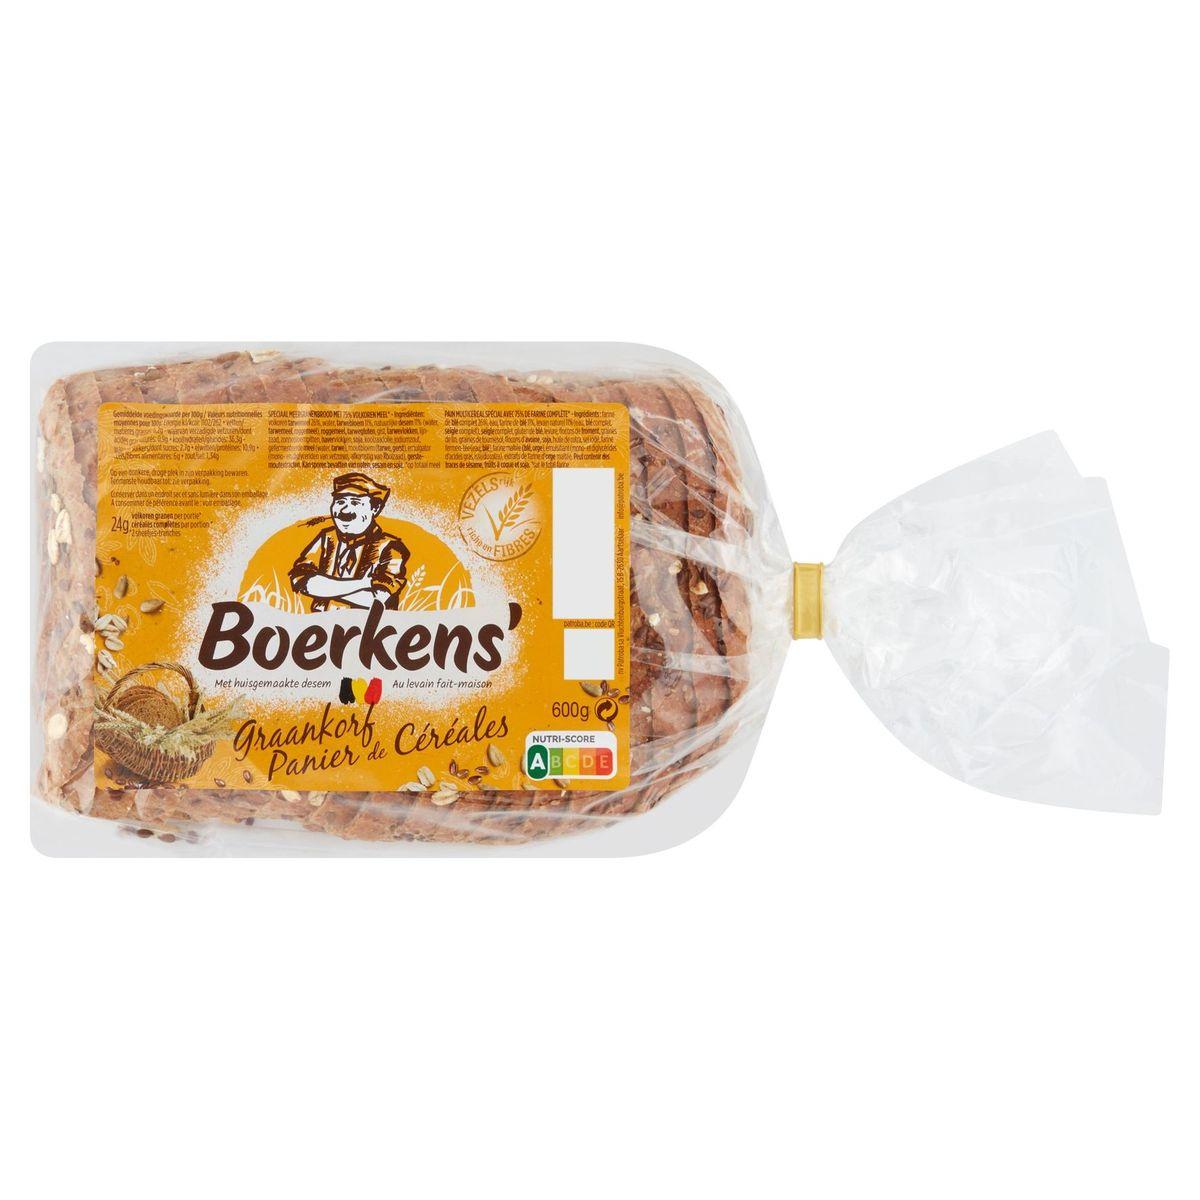 Boerkens' Panier de Céréales 600 g